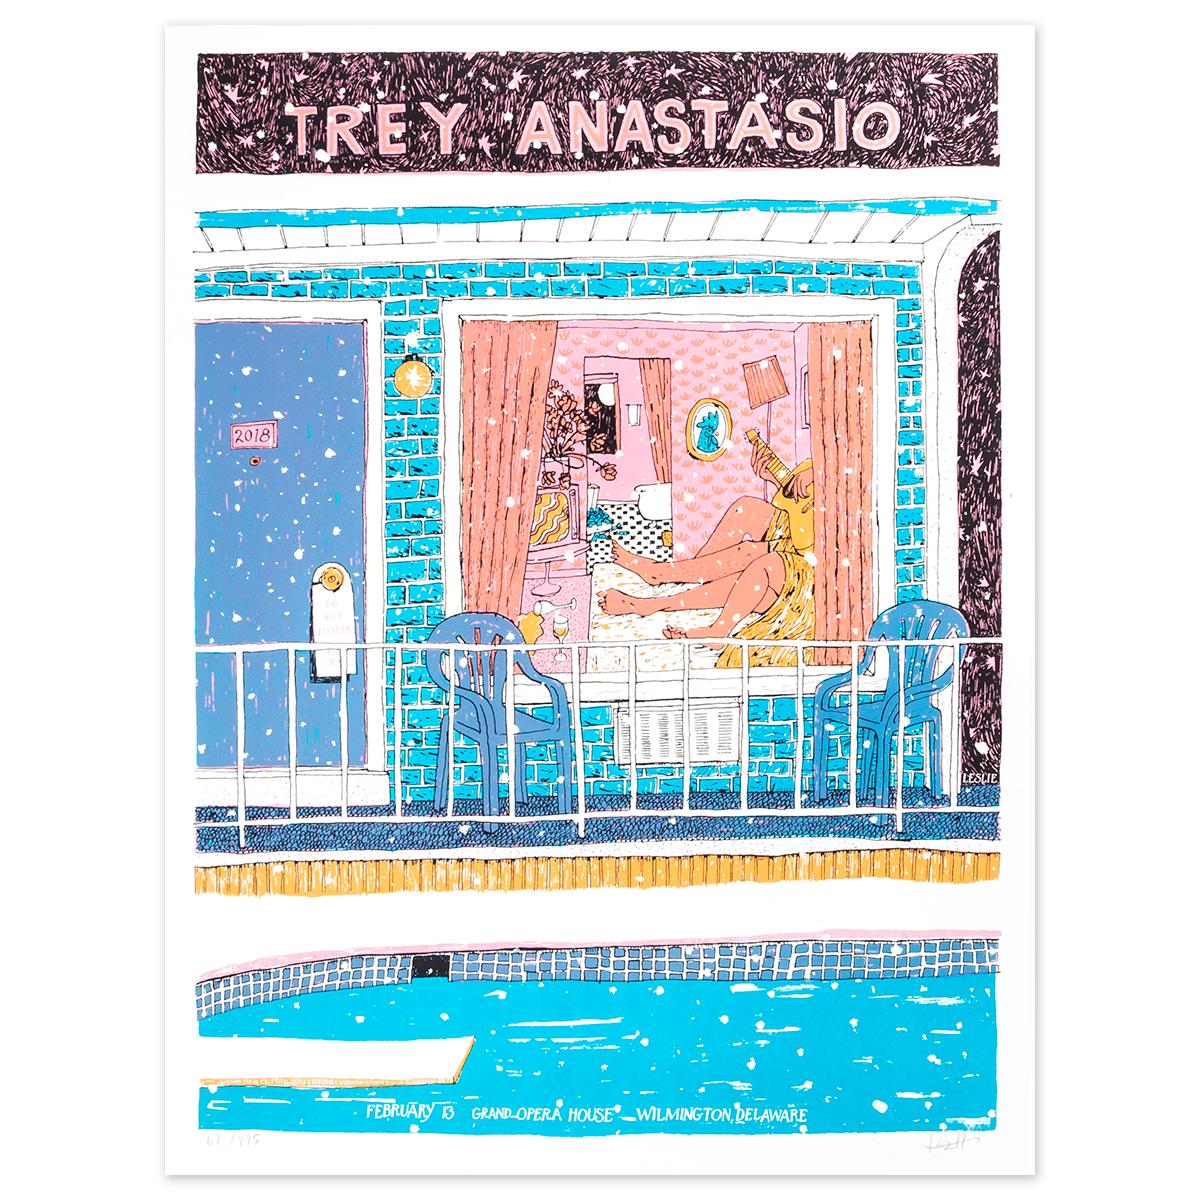 Trey Anastasio Grand Opera House, Wilmington LE Poster